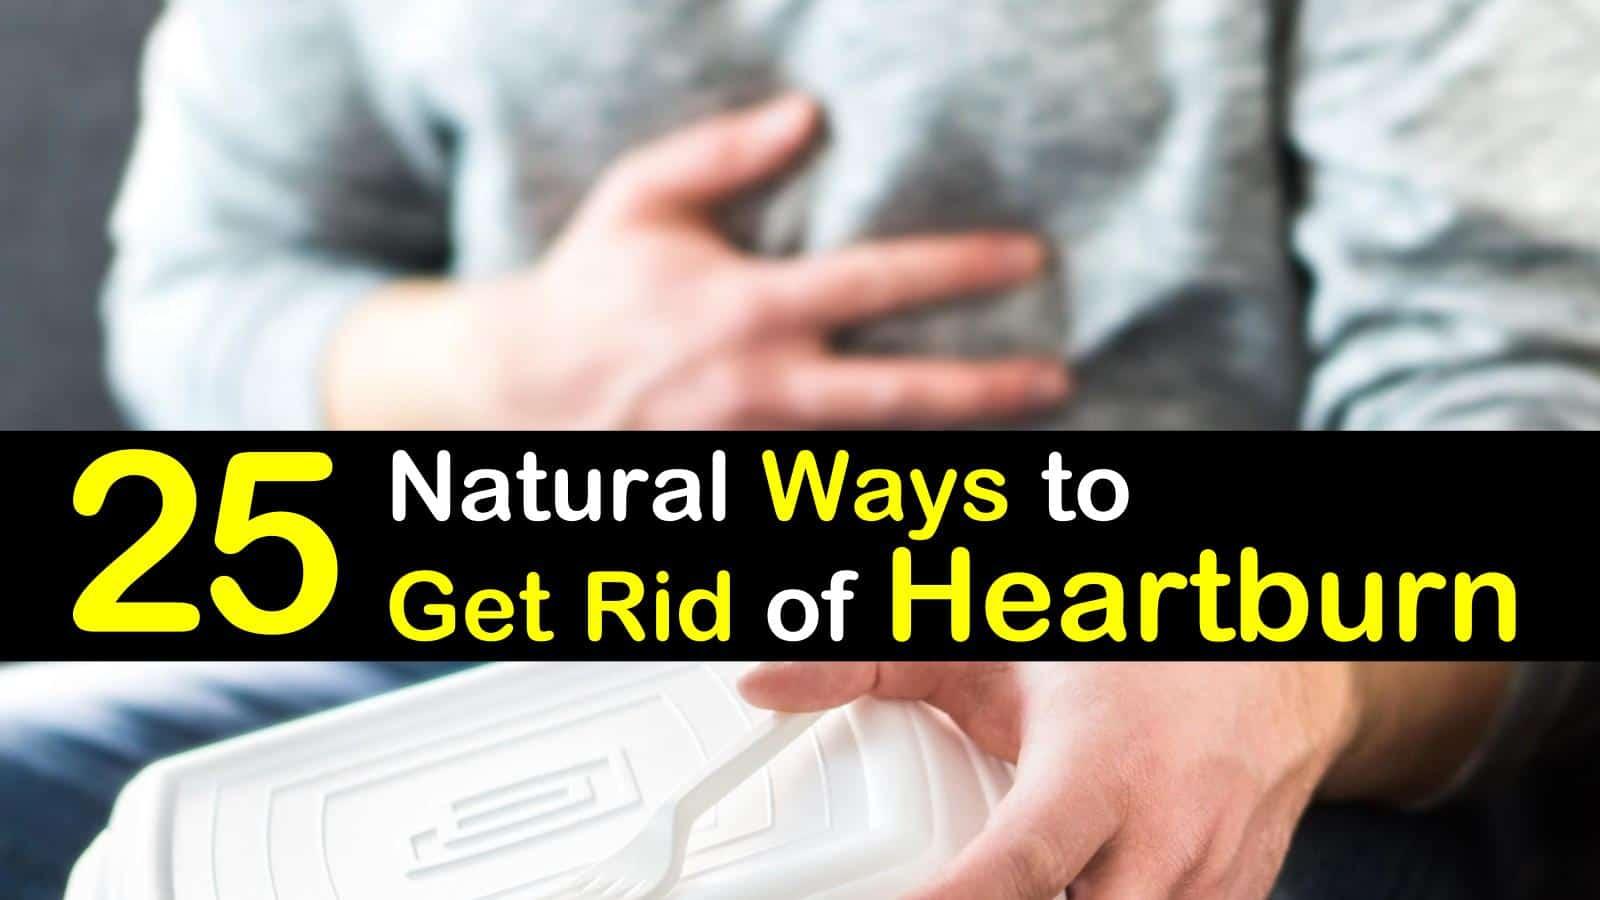 25 Natural Ways To Get Rid Of Heartburn titleimg1